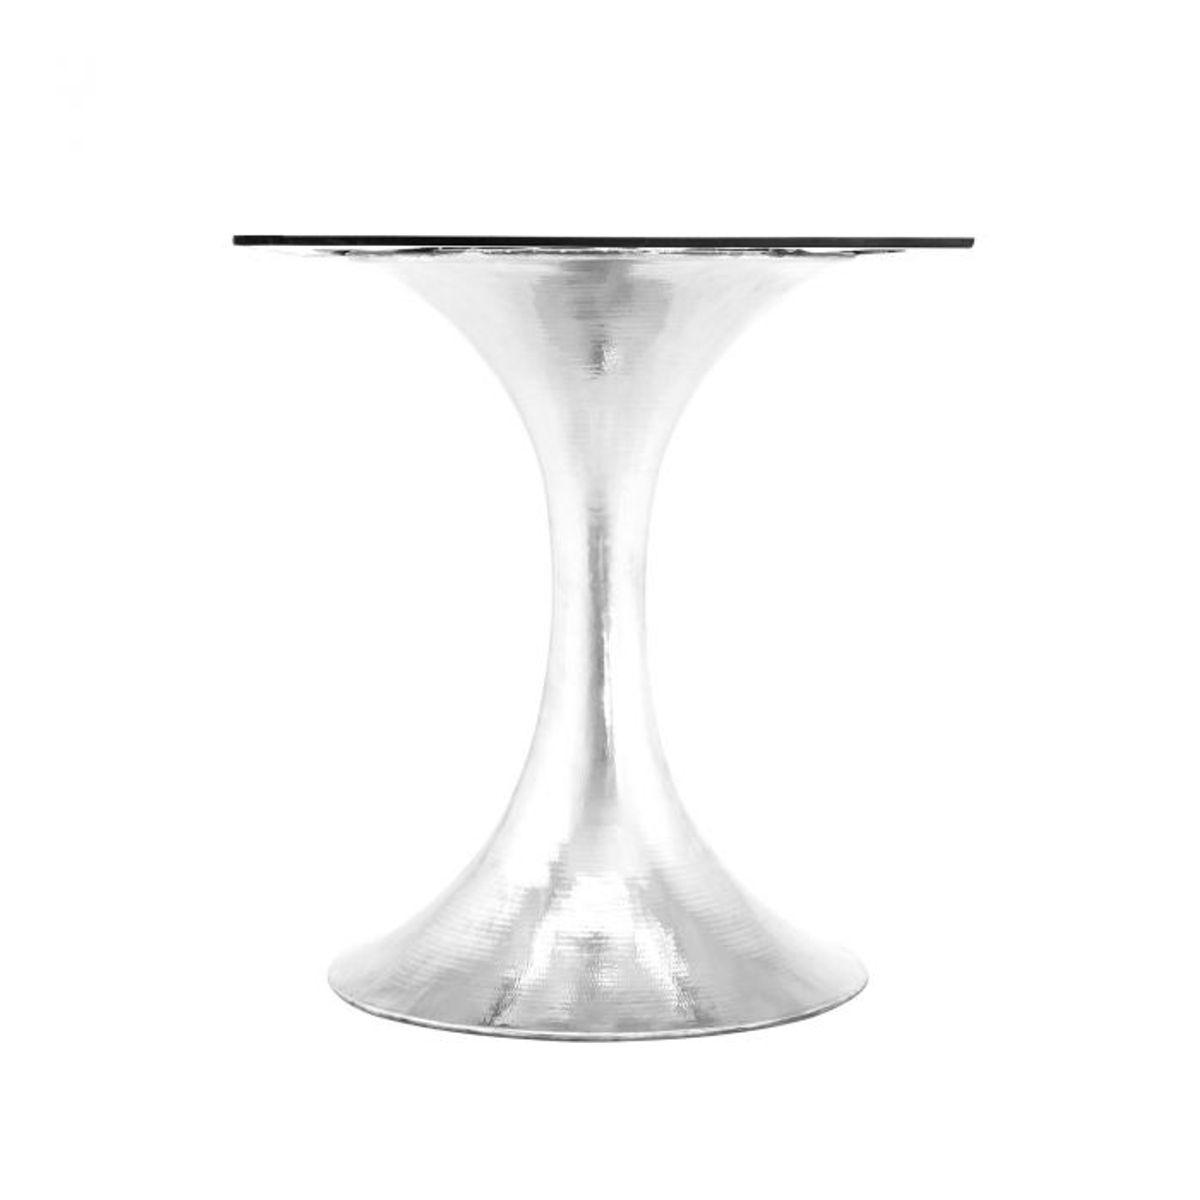 Stockholm Dining Table Base, Nickel